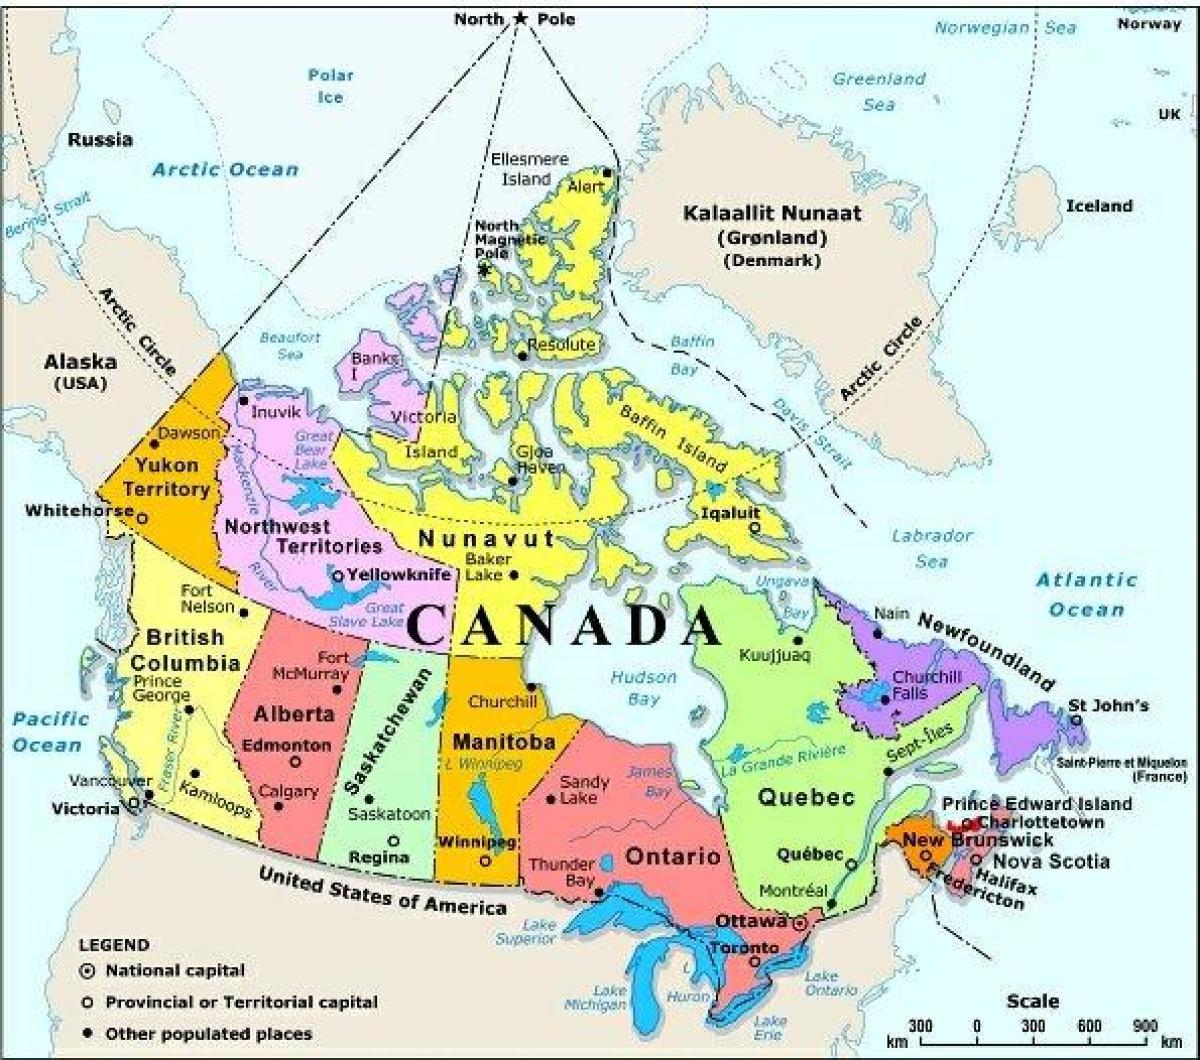 Amerika Gradovi Karta.Zapadna Kanada Kartica S Gradovima Karta Zapadne Kanade Sa